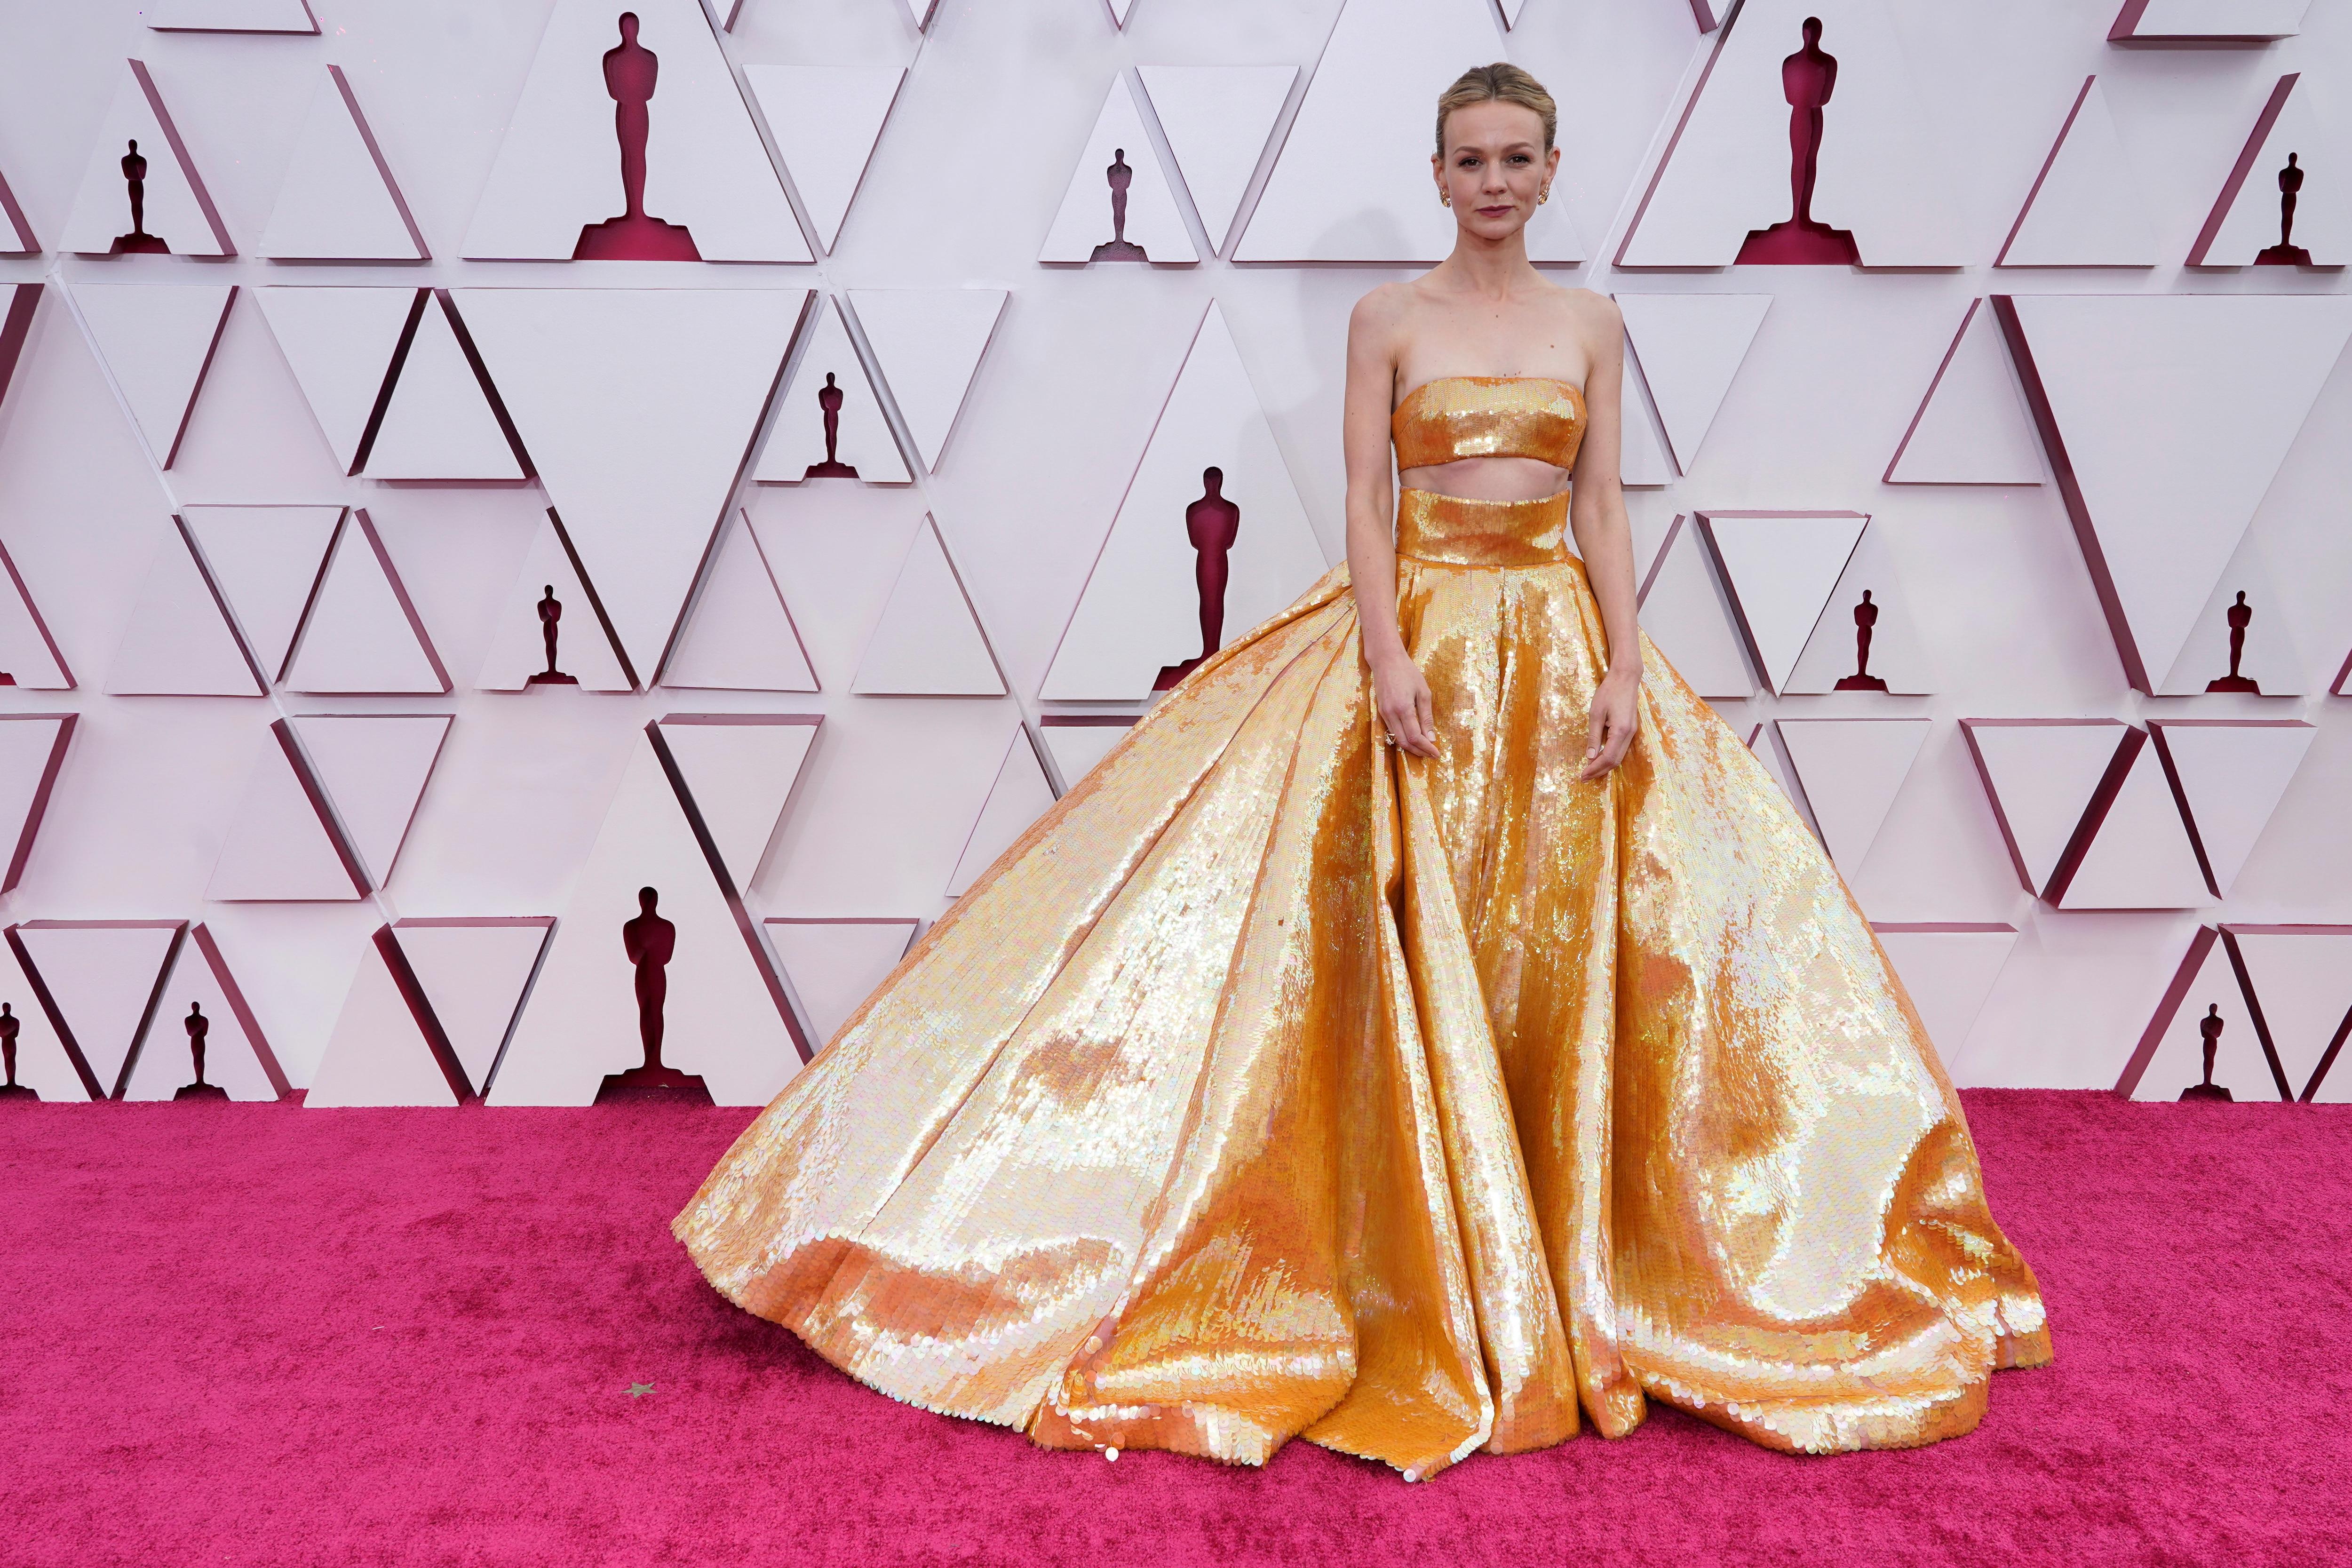 Regina King, Carey Mulligan, others step back onto Oscars red carpet 3